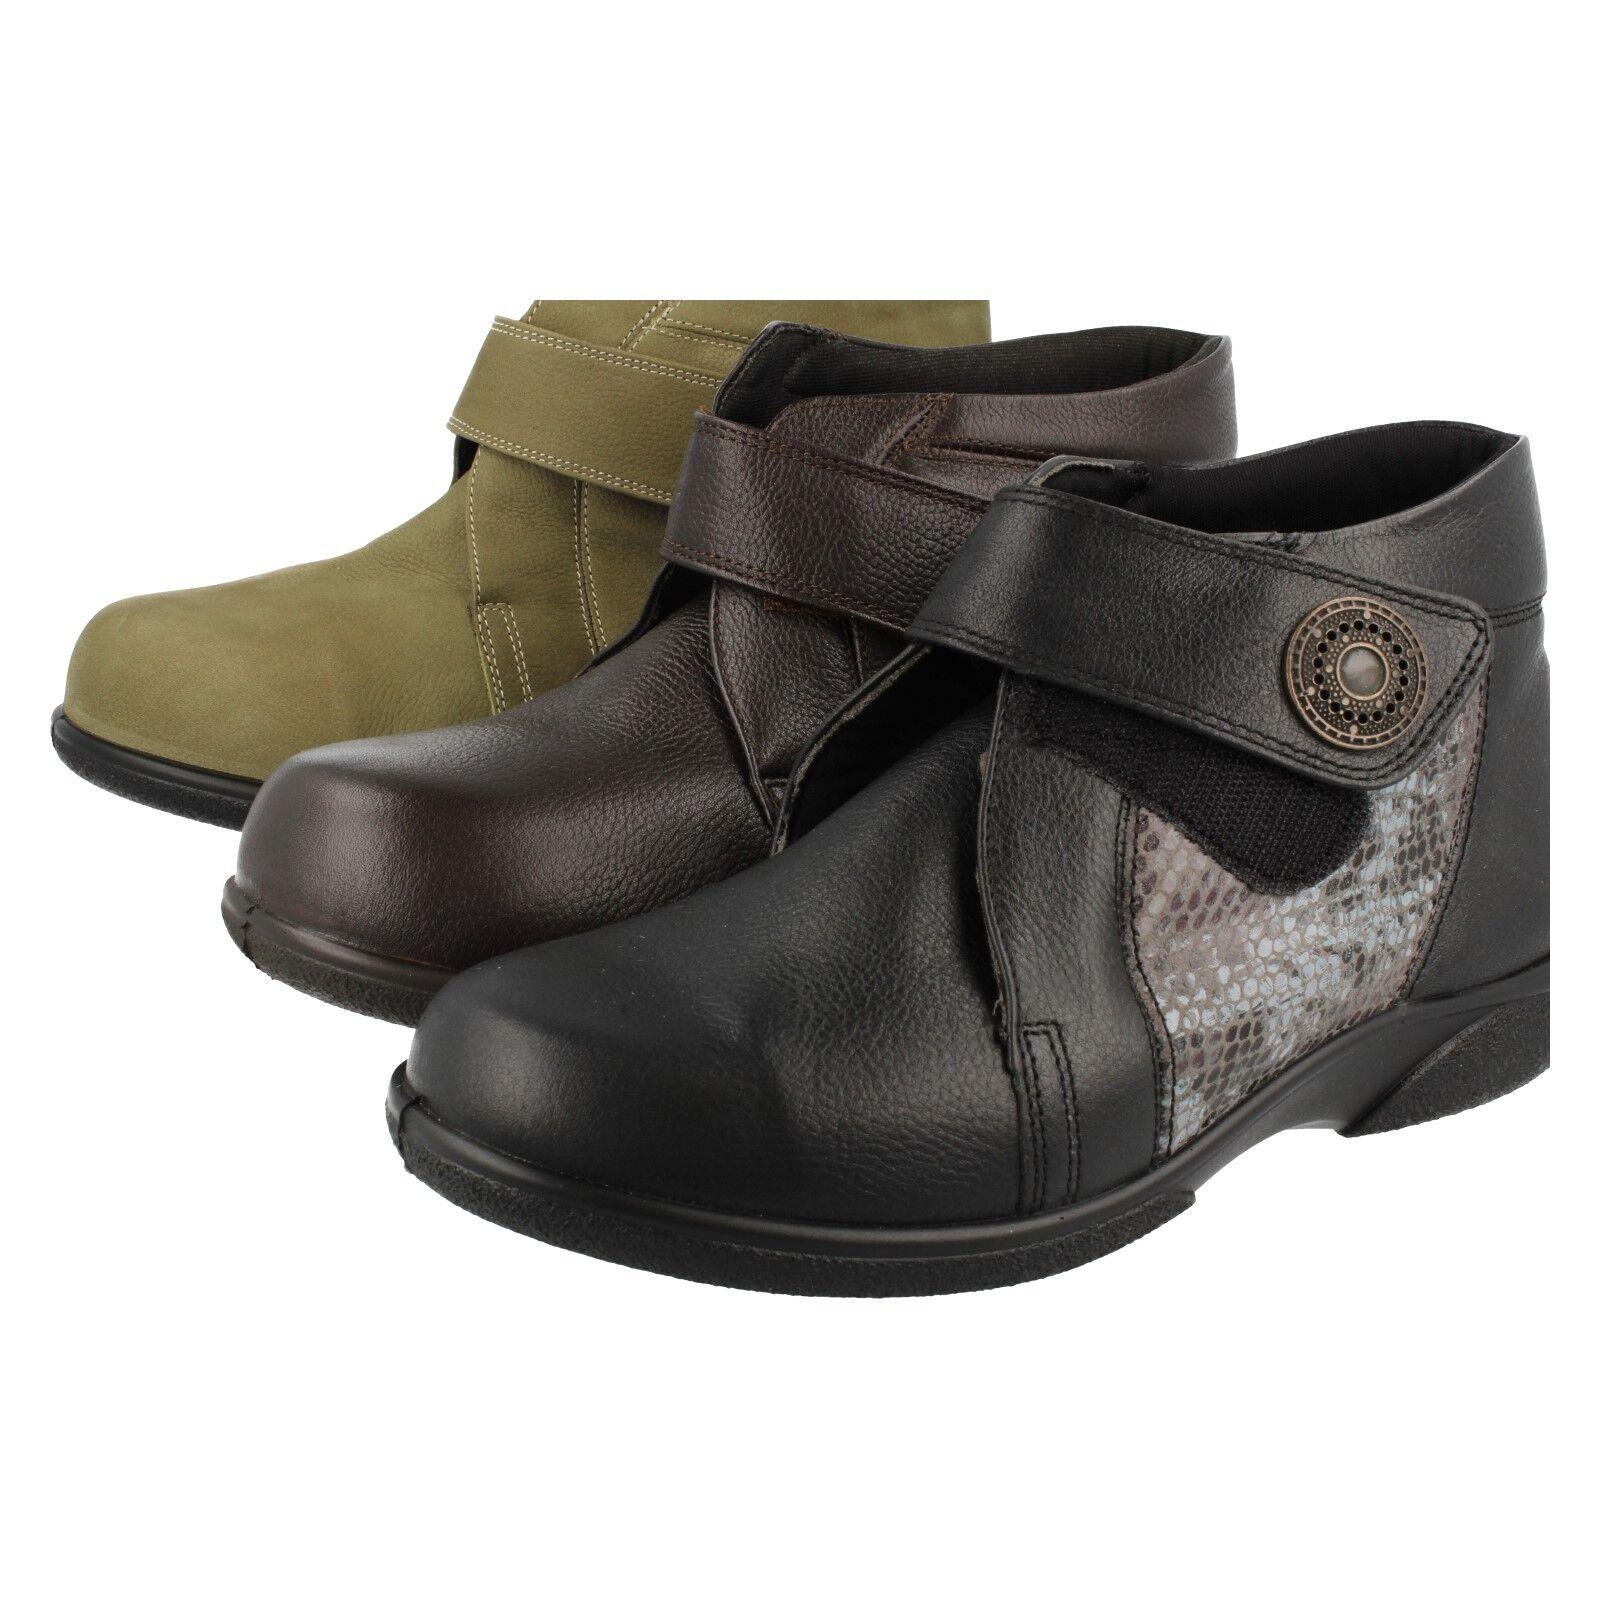 Ladies Easy B Black,Snake   Brown   Olive Nubuck Leather Ankle Boot Doris